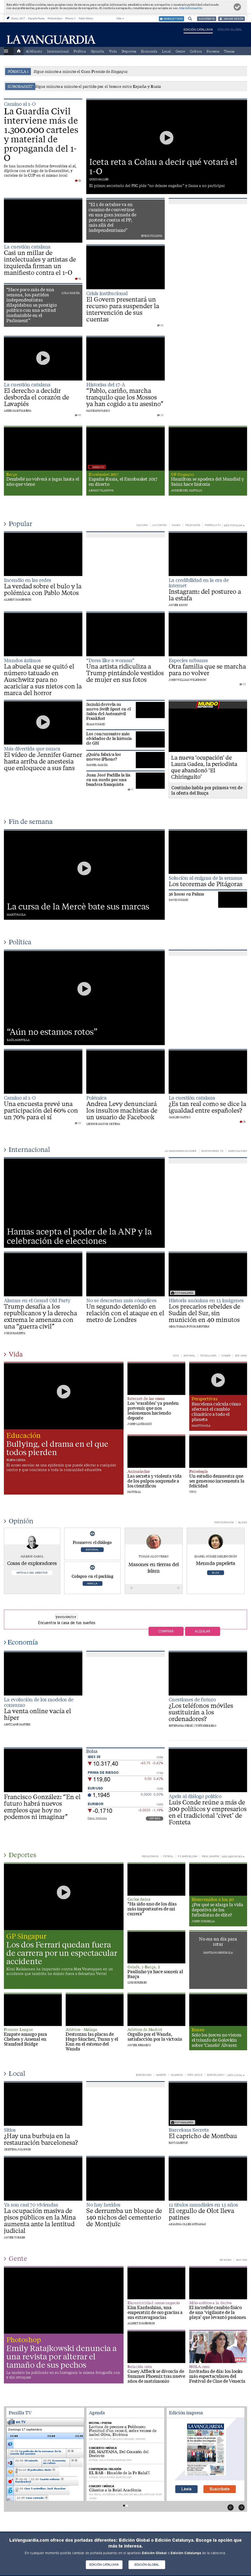 La Vanguardia at Sunday Sept. 17, 2017, 3:23 p.m. UTC